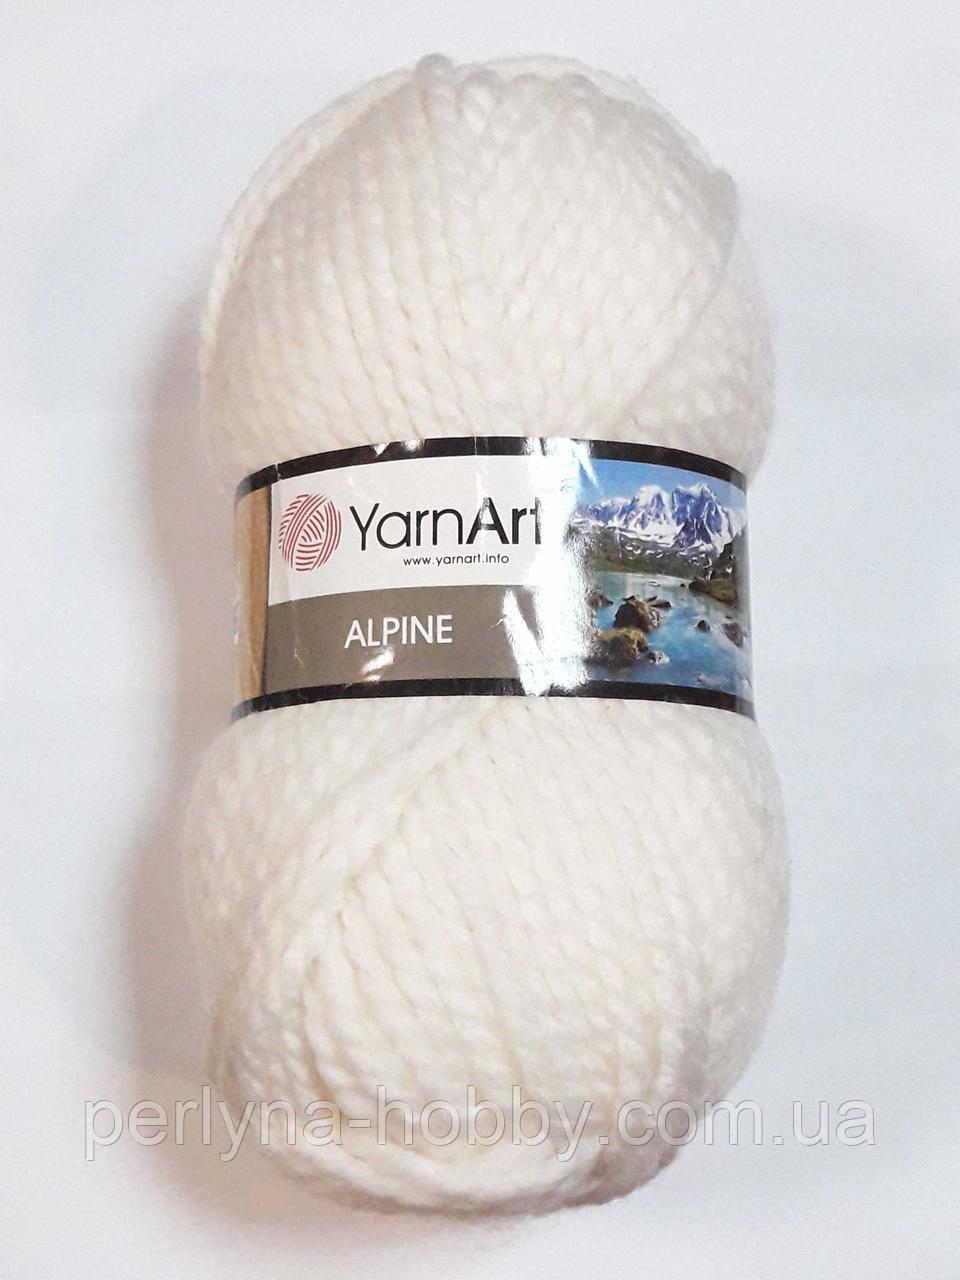 Товста пряжа для в'язання YarnArt Alpine. Толстая пряжа Альпин сіра світла